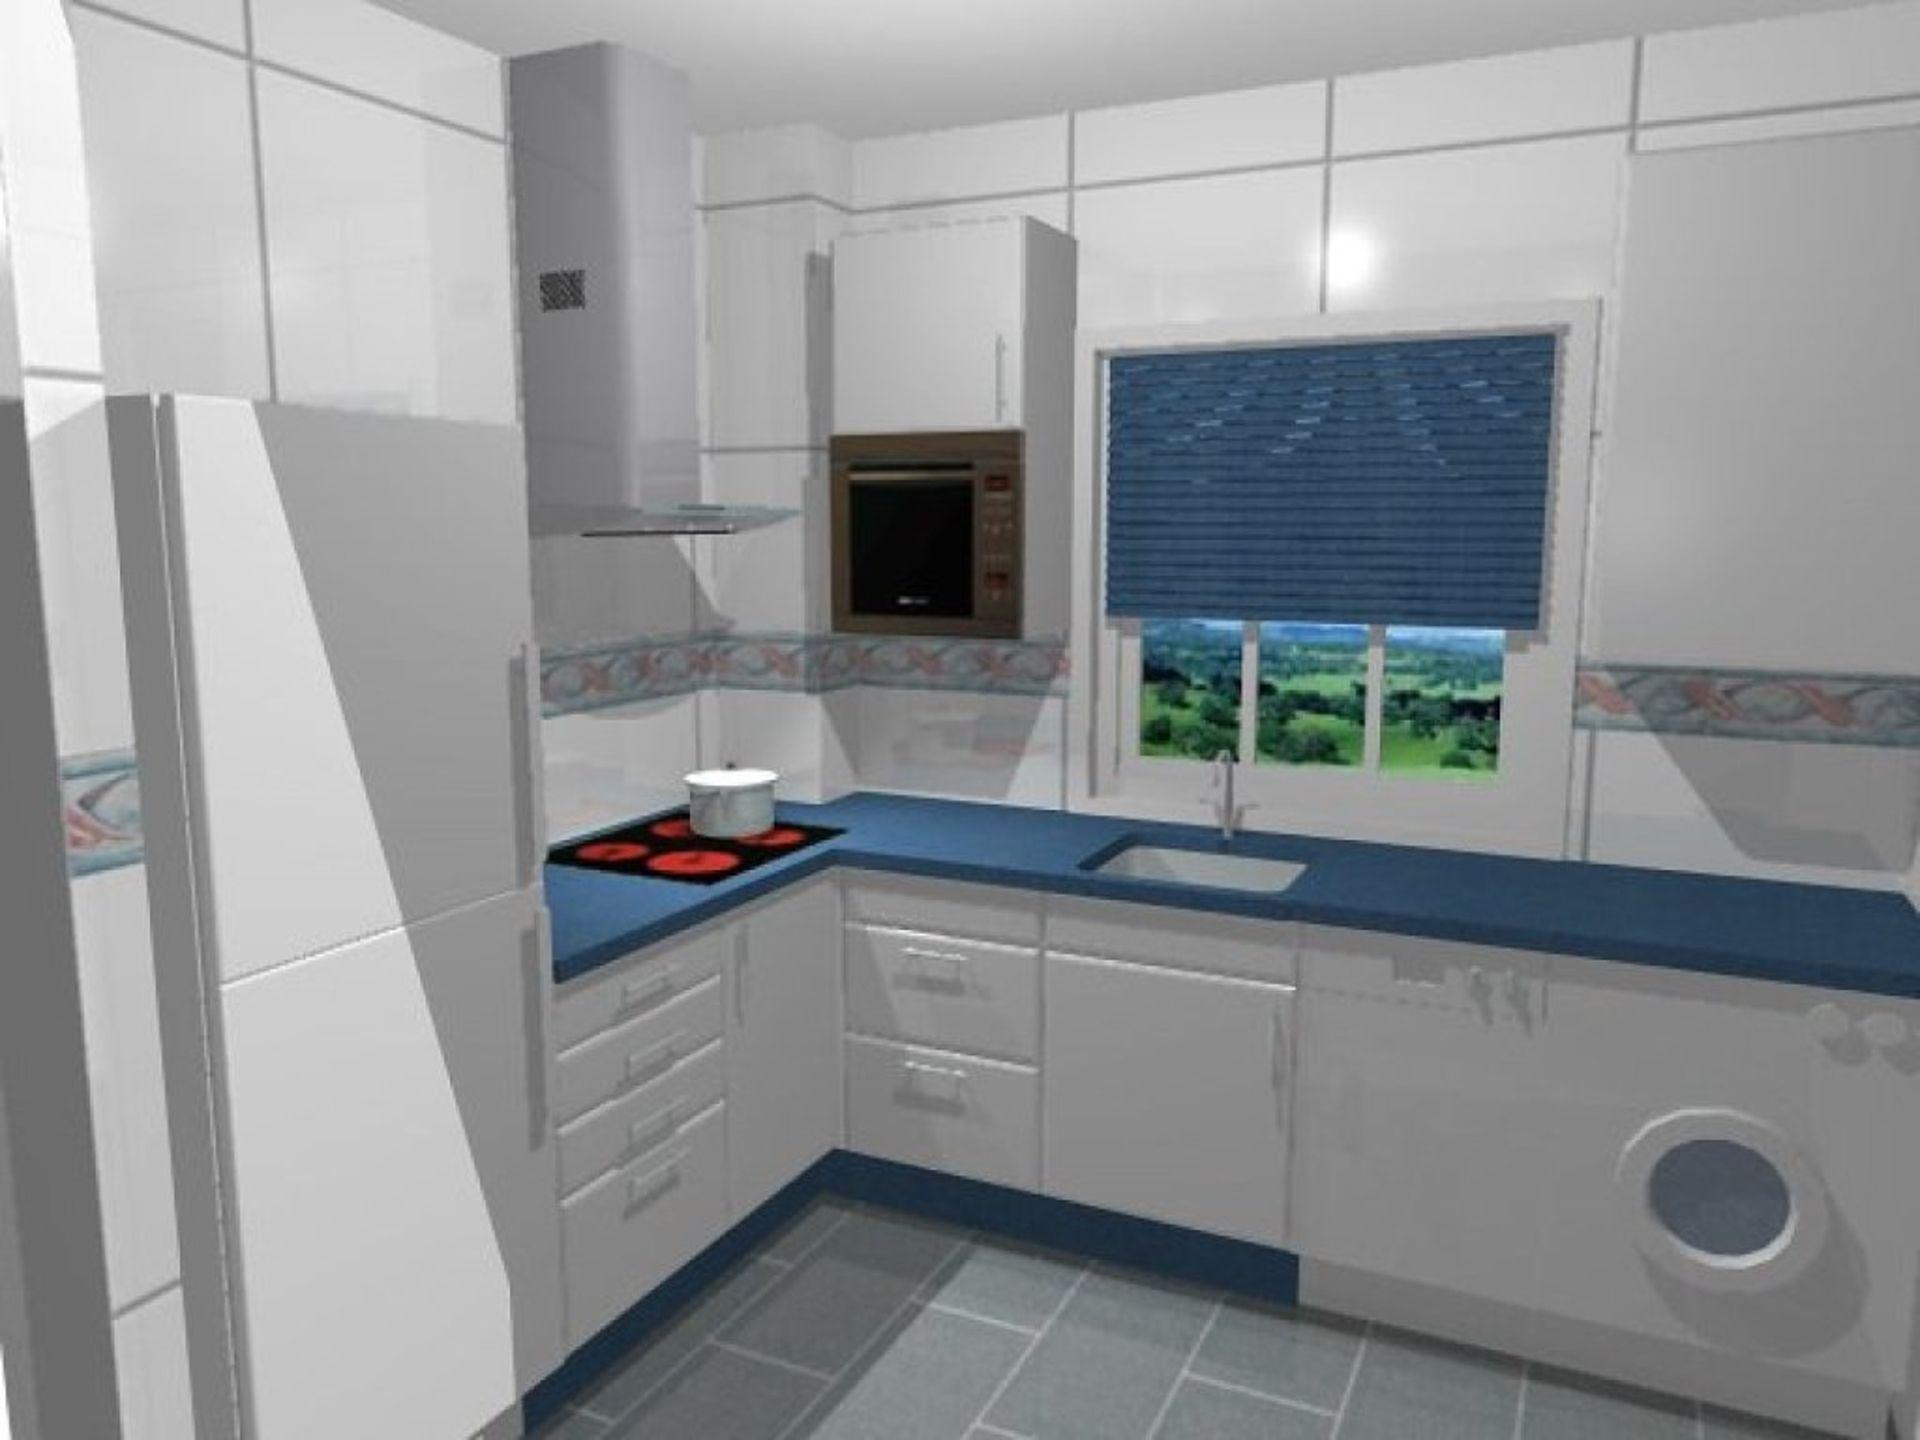 modern small kitchen design home decor furniture interior rh pinterest com